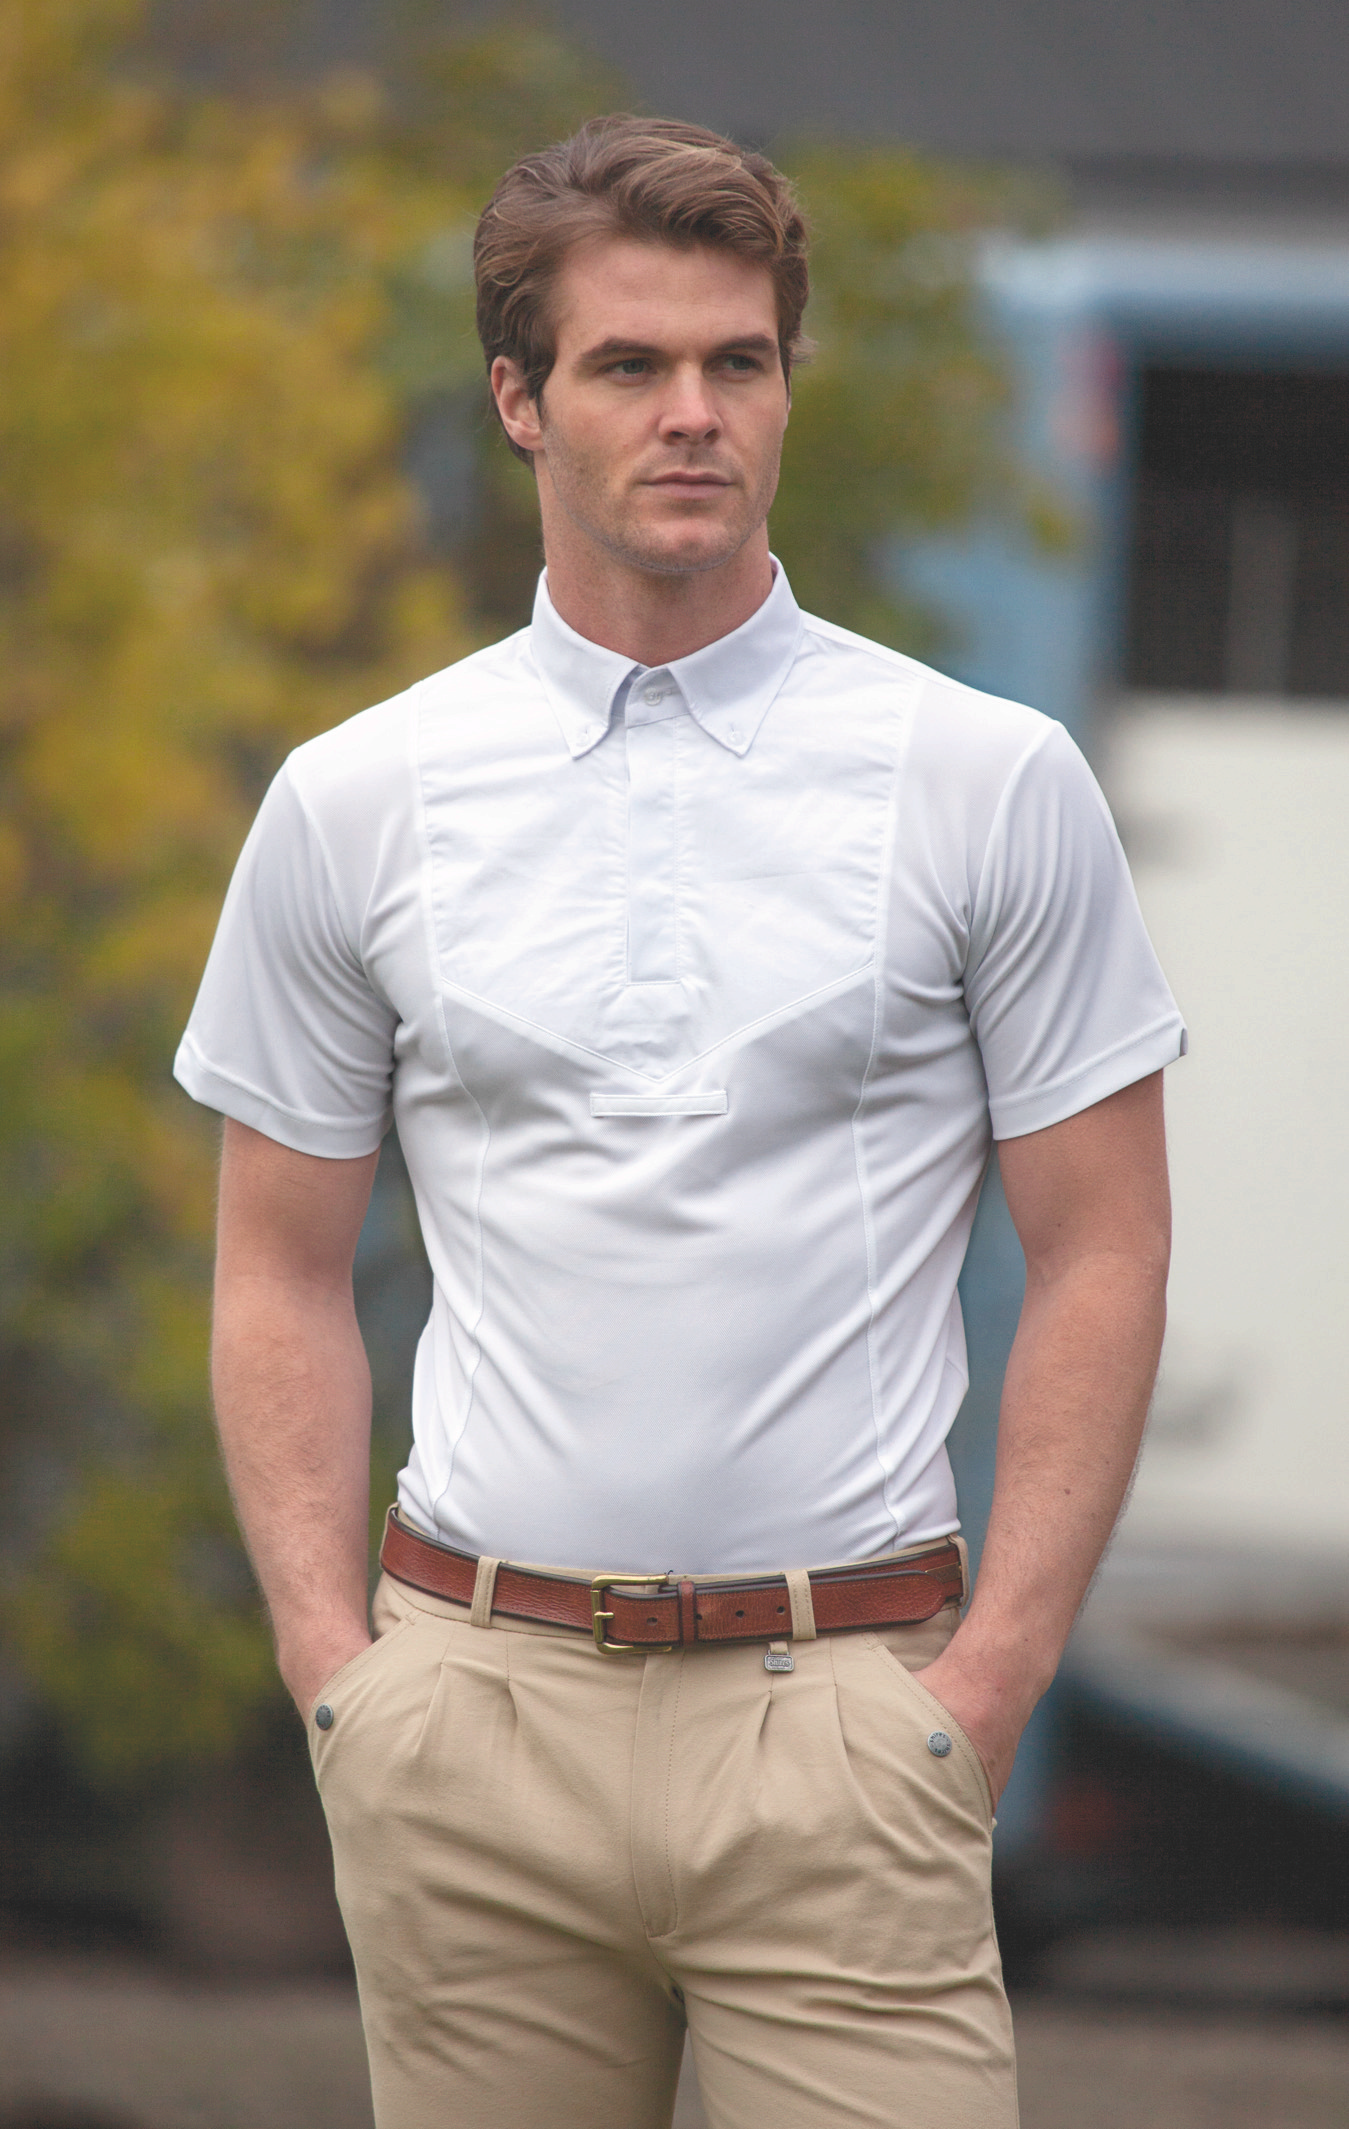 Shires Gents Short Sleeve Tie Shirt